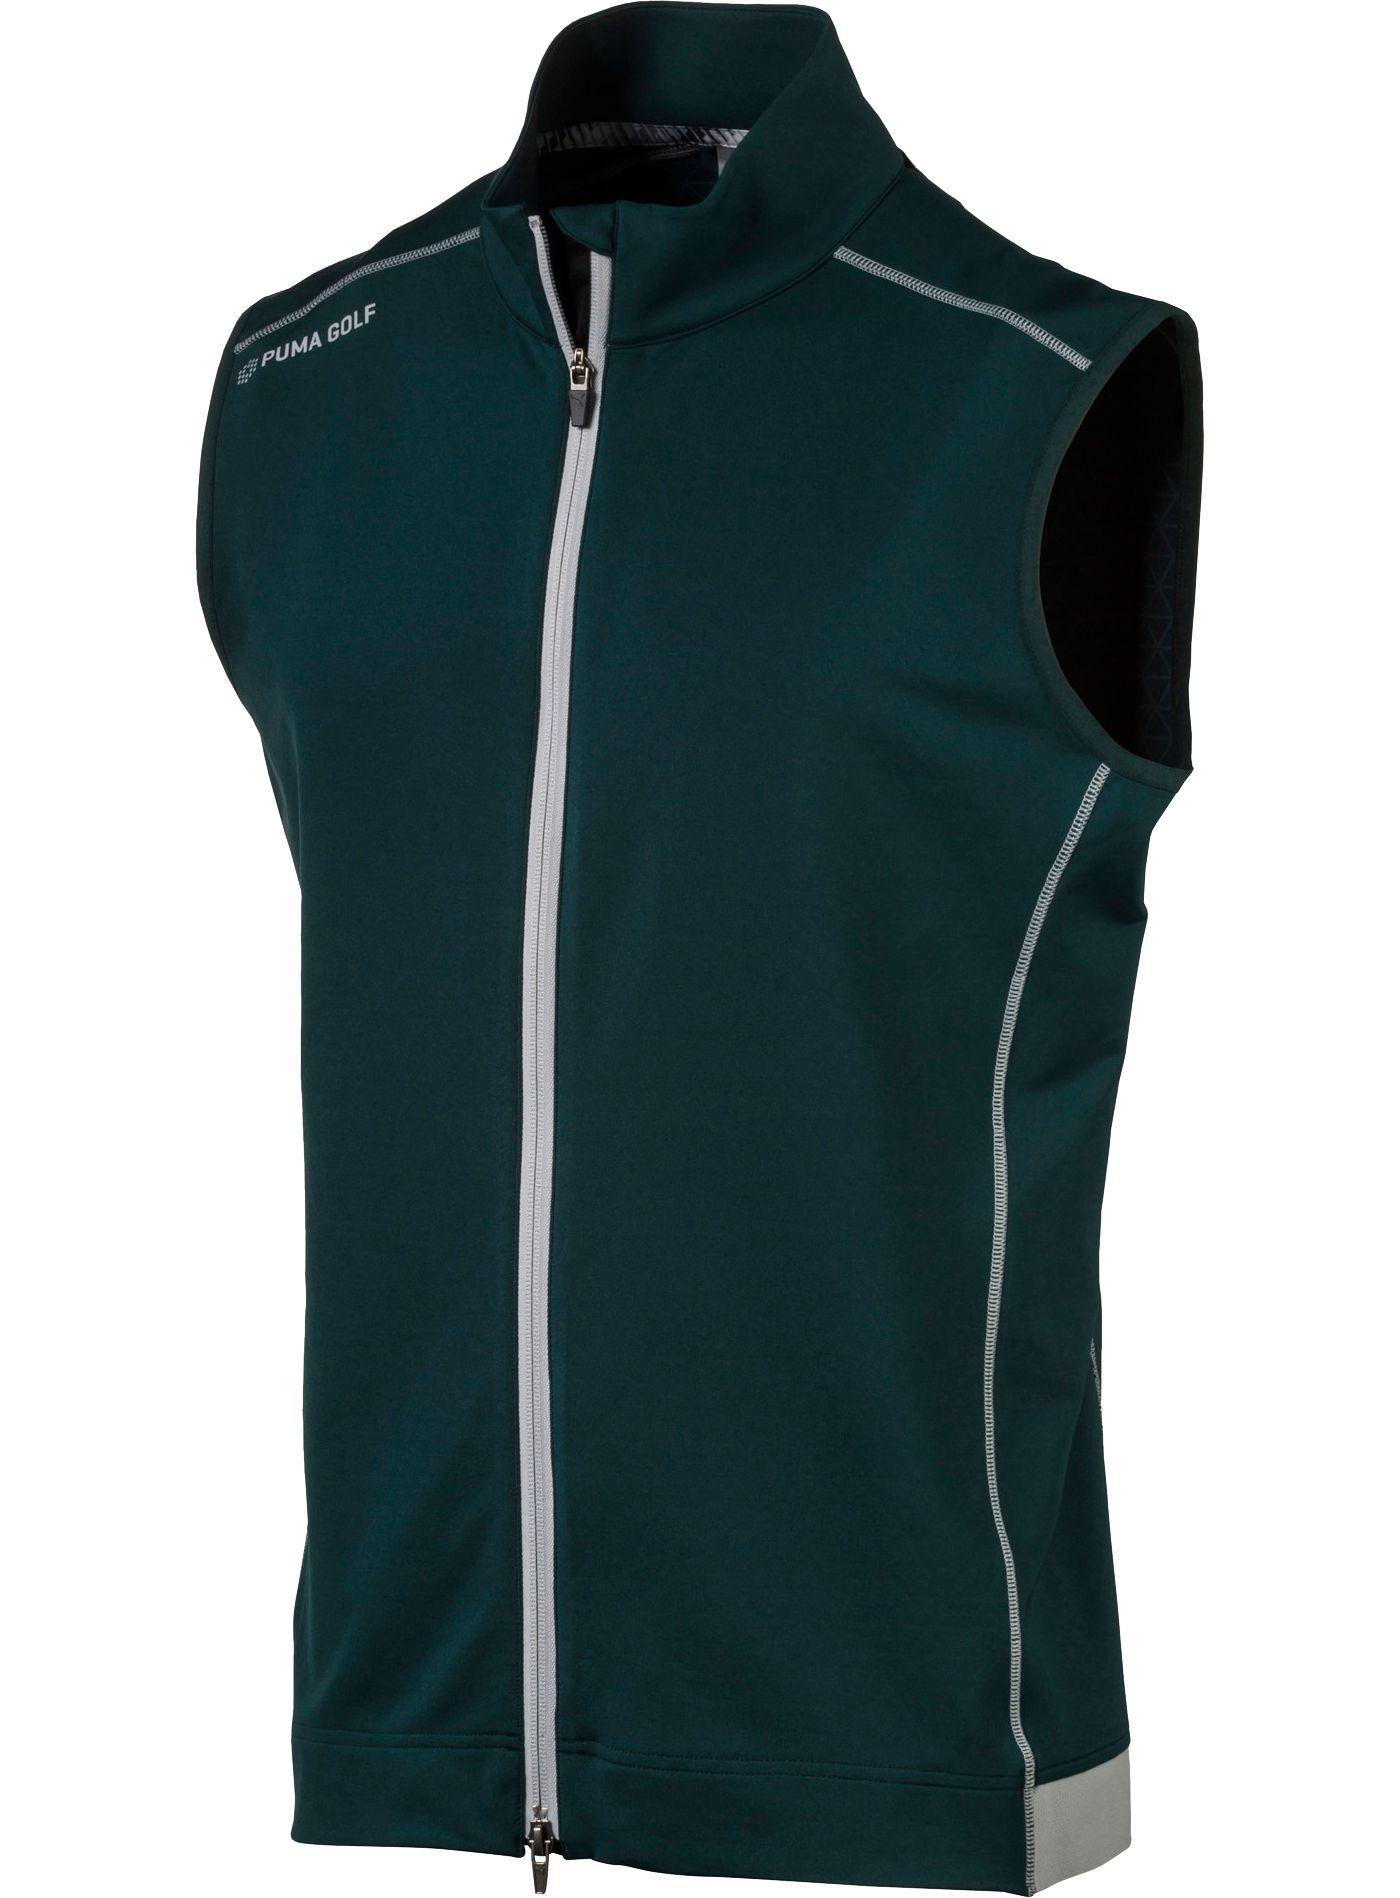 PUMA Men's PWRWARM Golf Vest